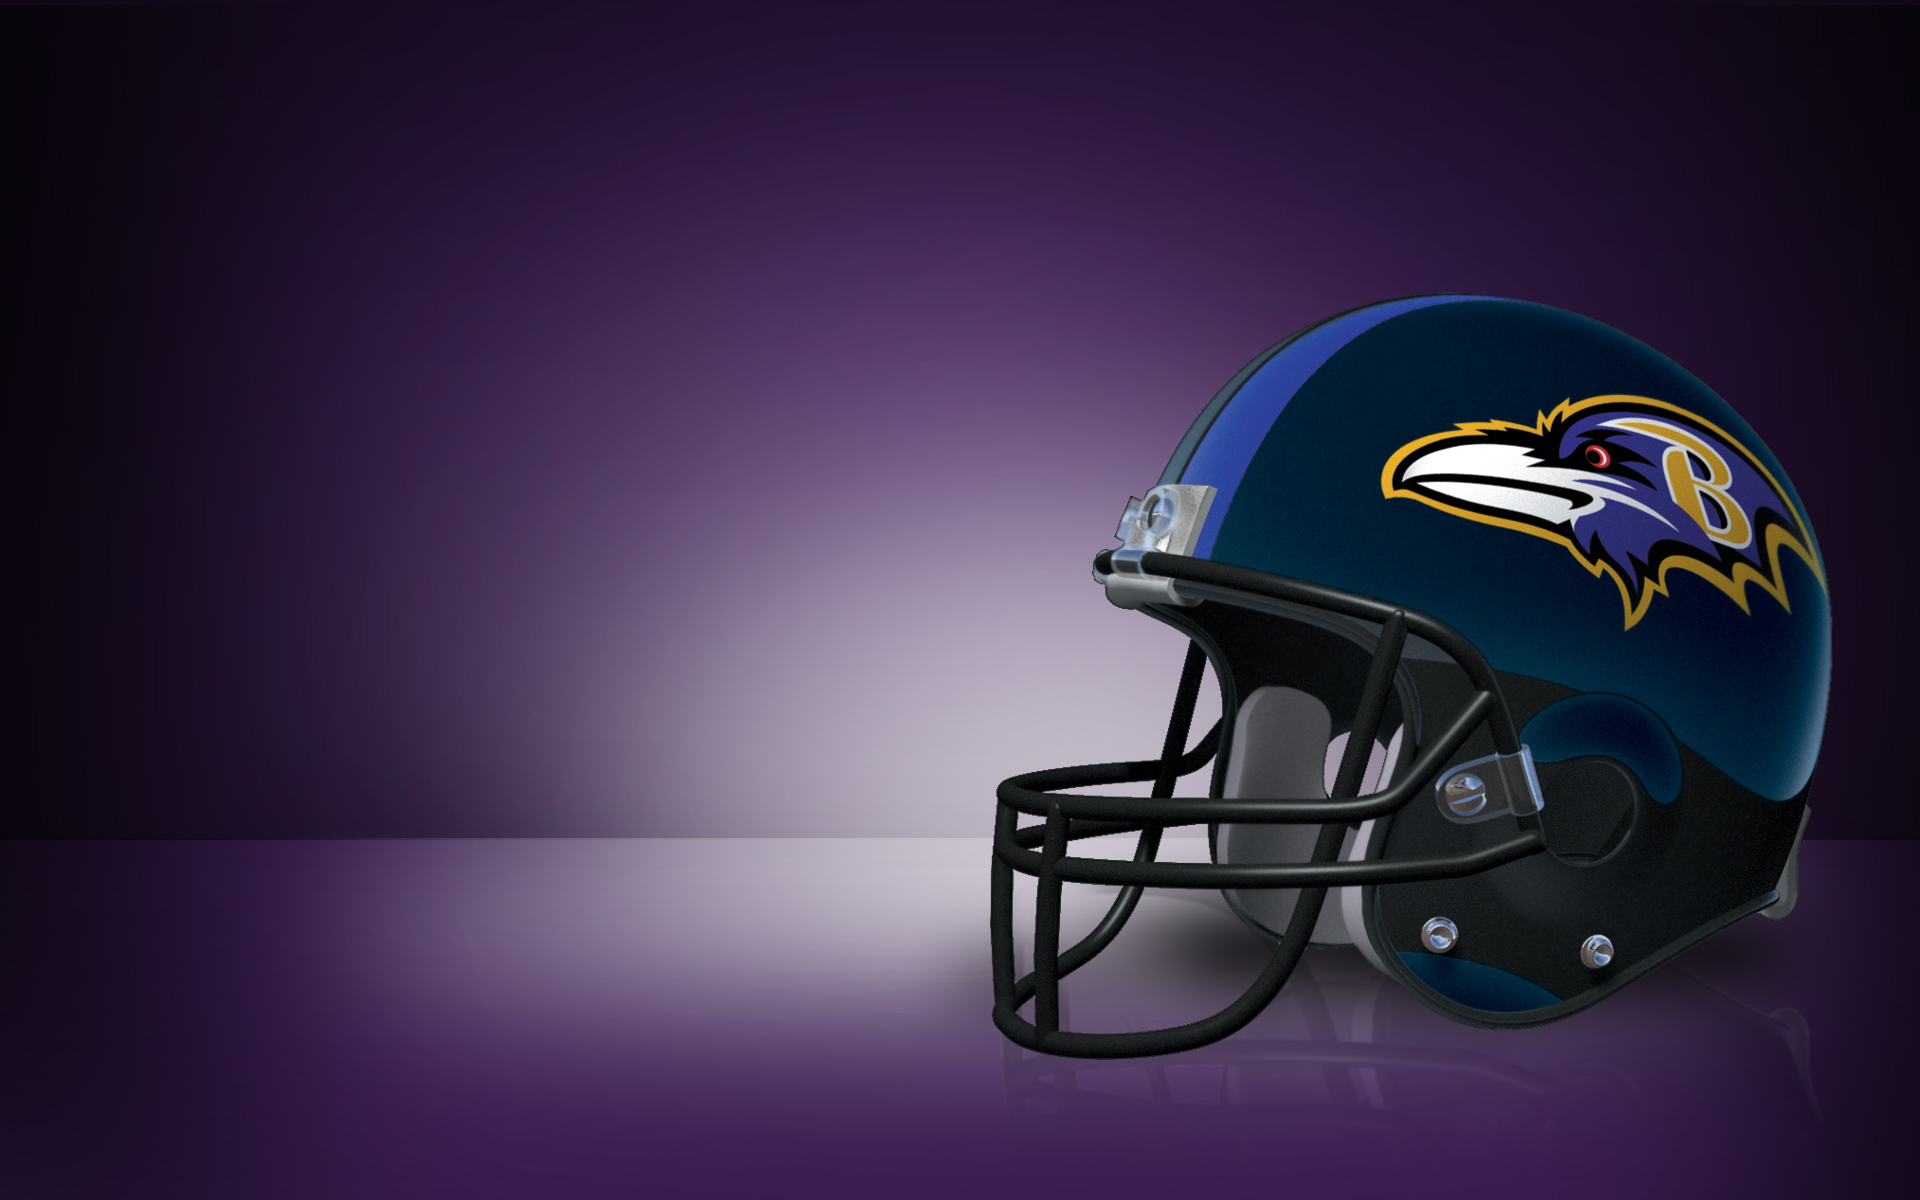 Baltimore Ravens Screen Saver Helmet Entertainment 1920x1200